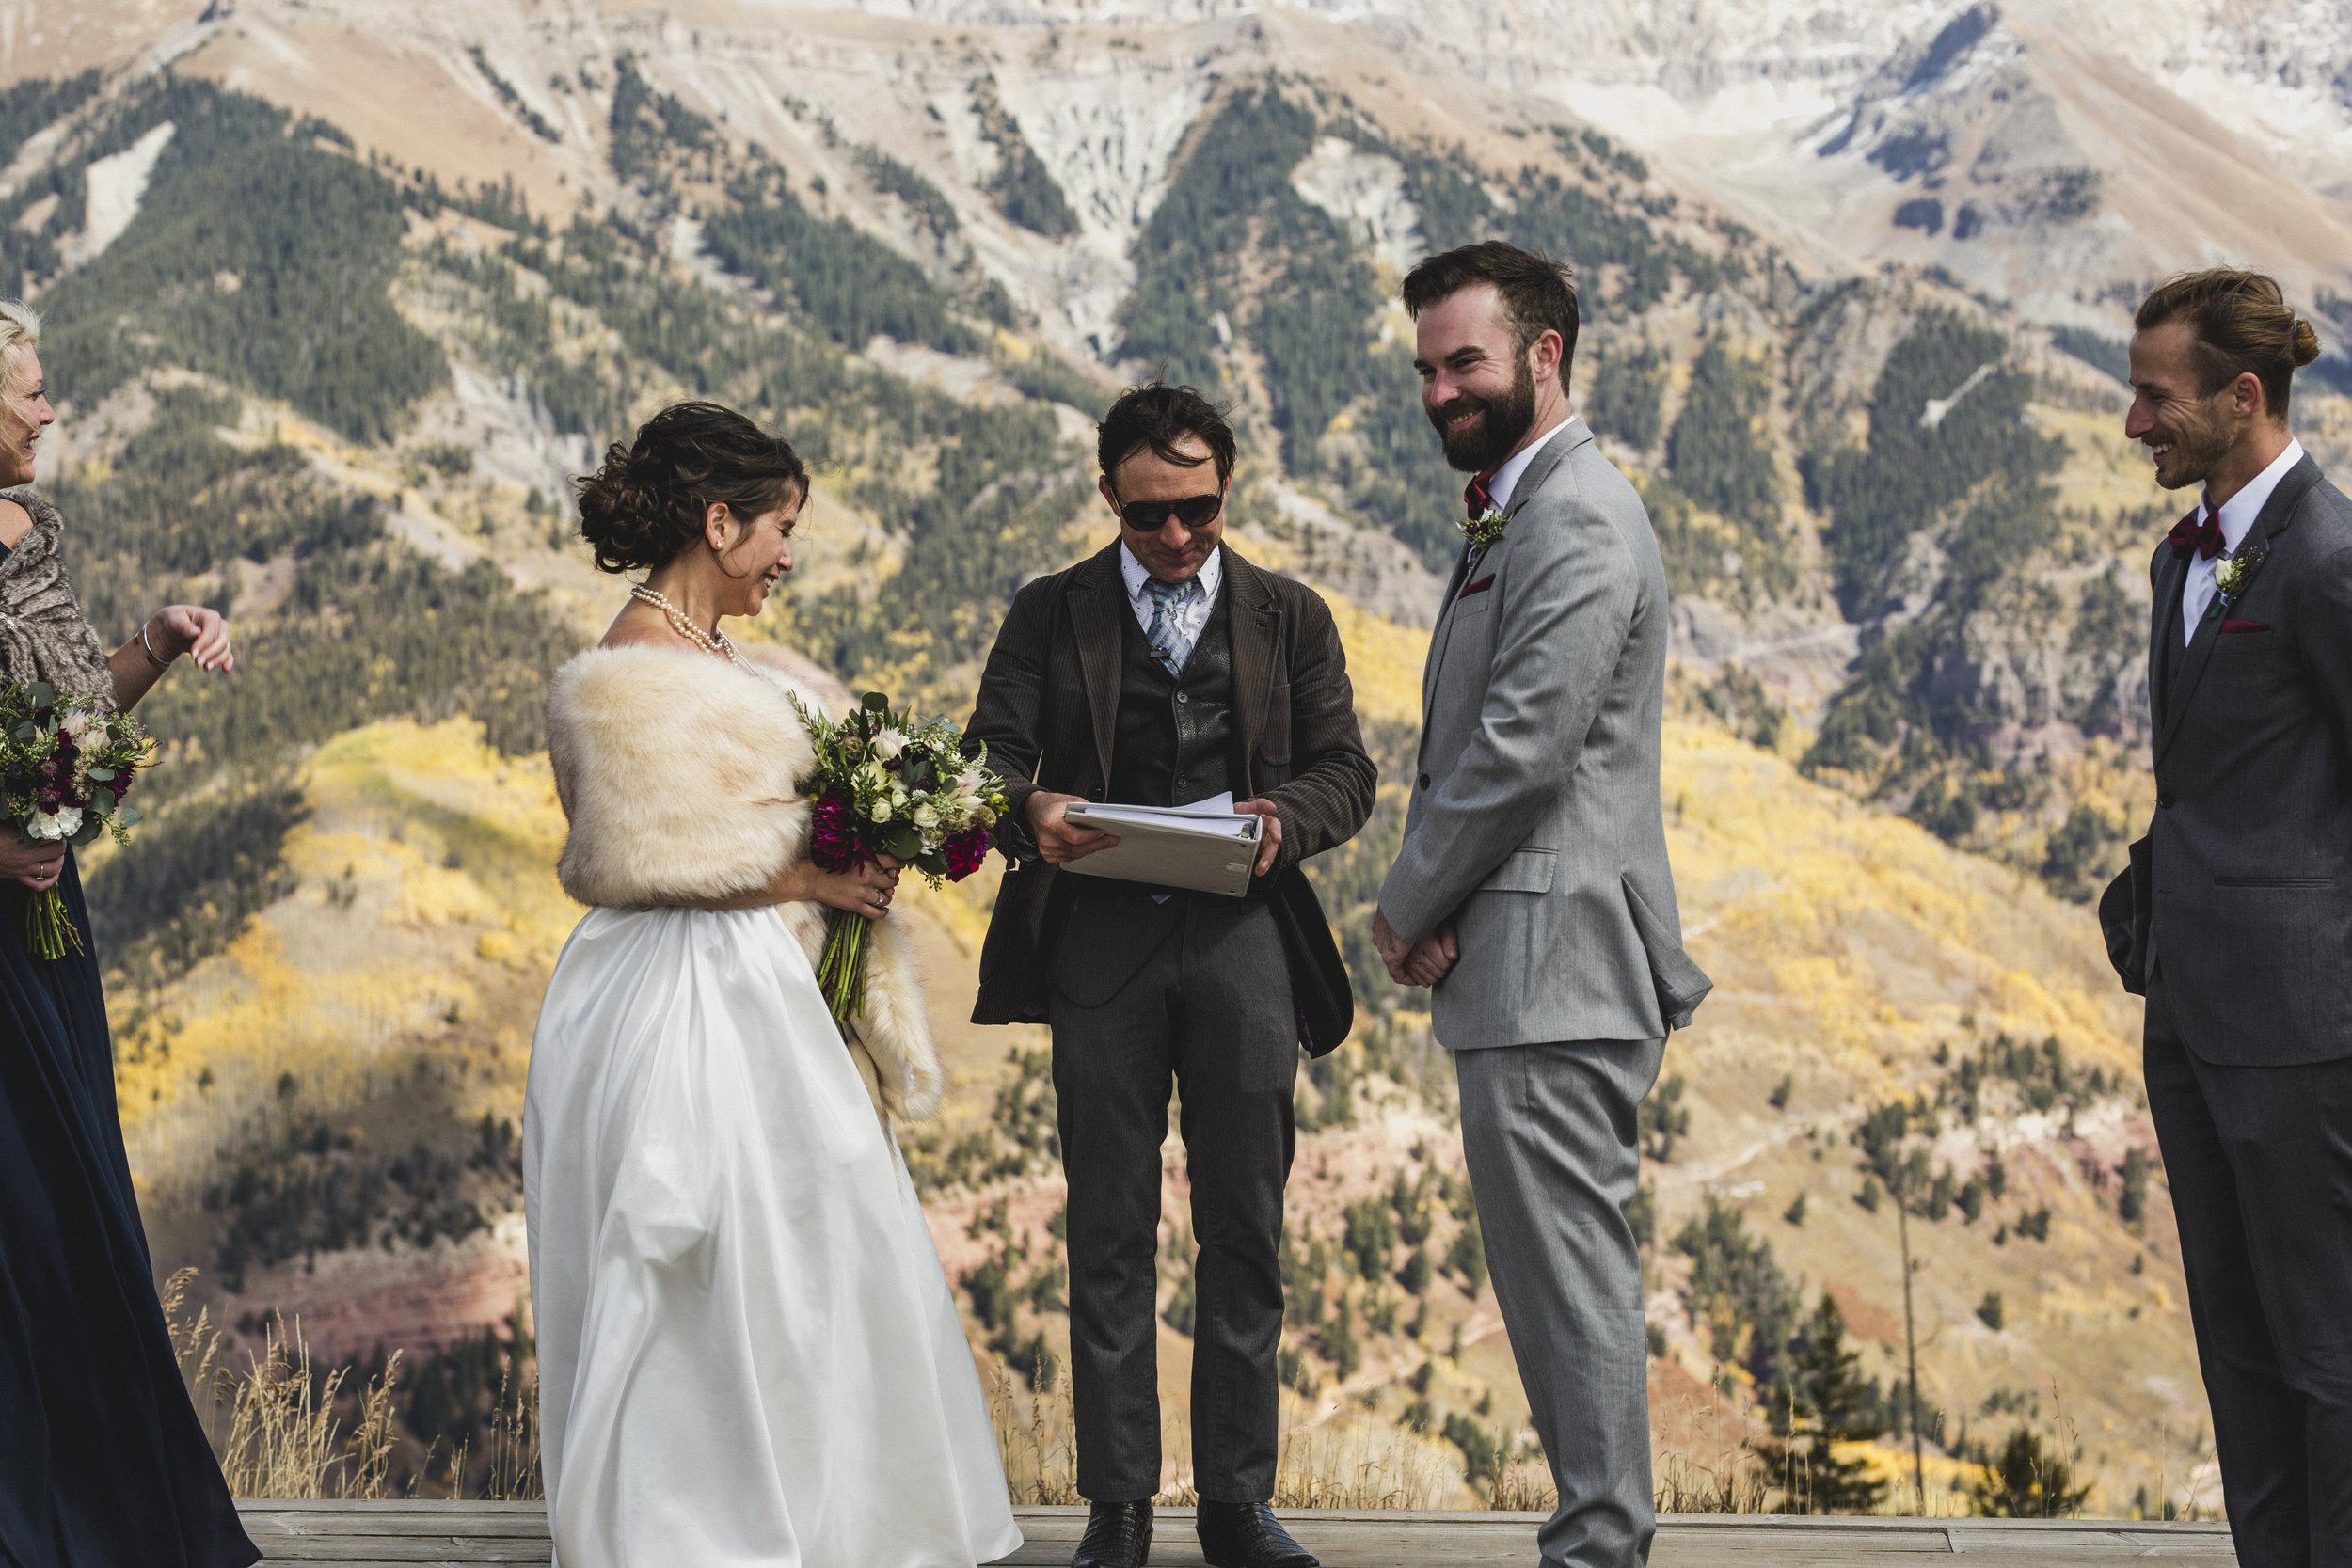 NE-LeahandAshtonphotography-Telluride-Wedding-Photography-9341.jpg